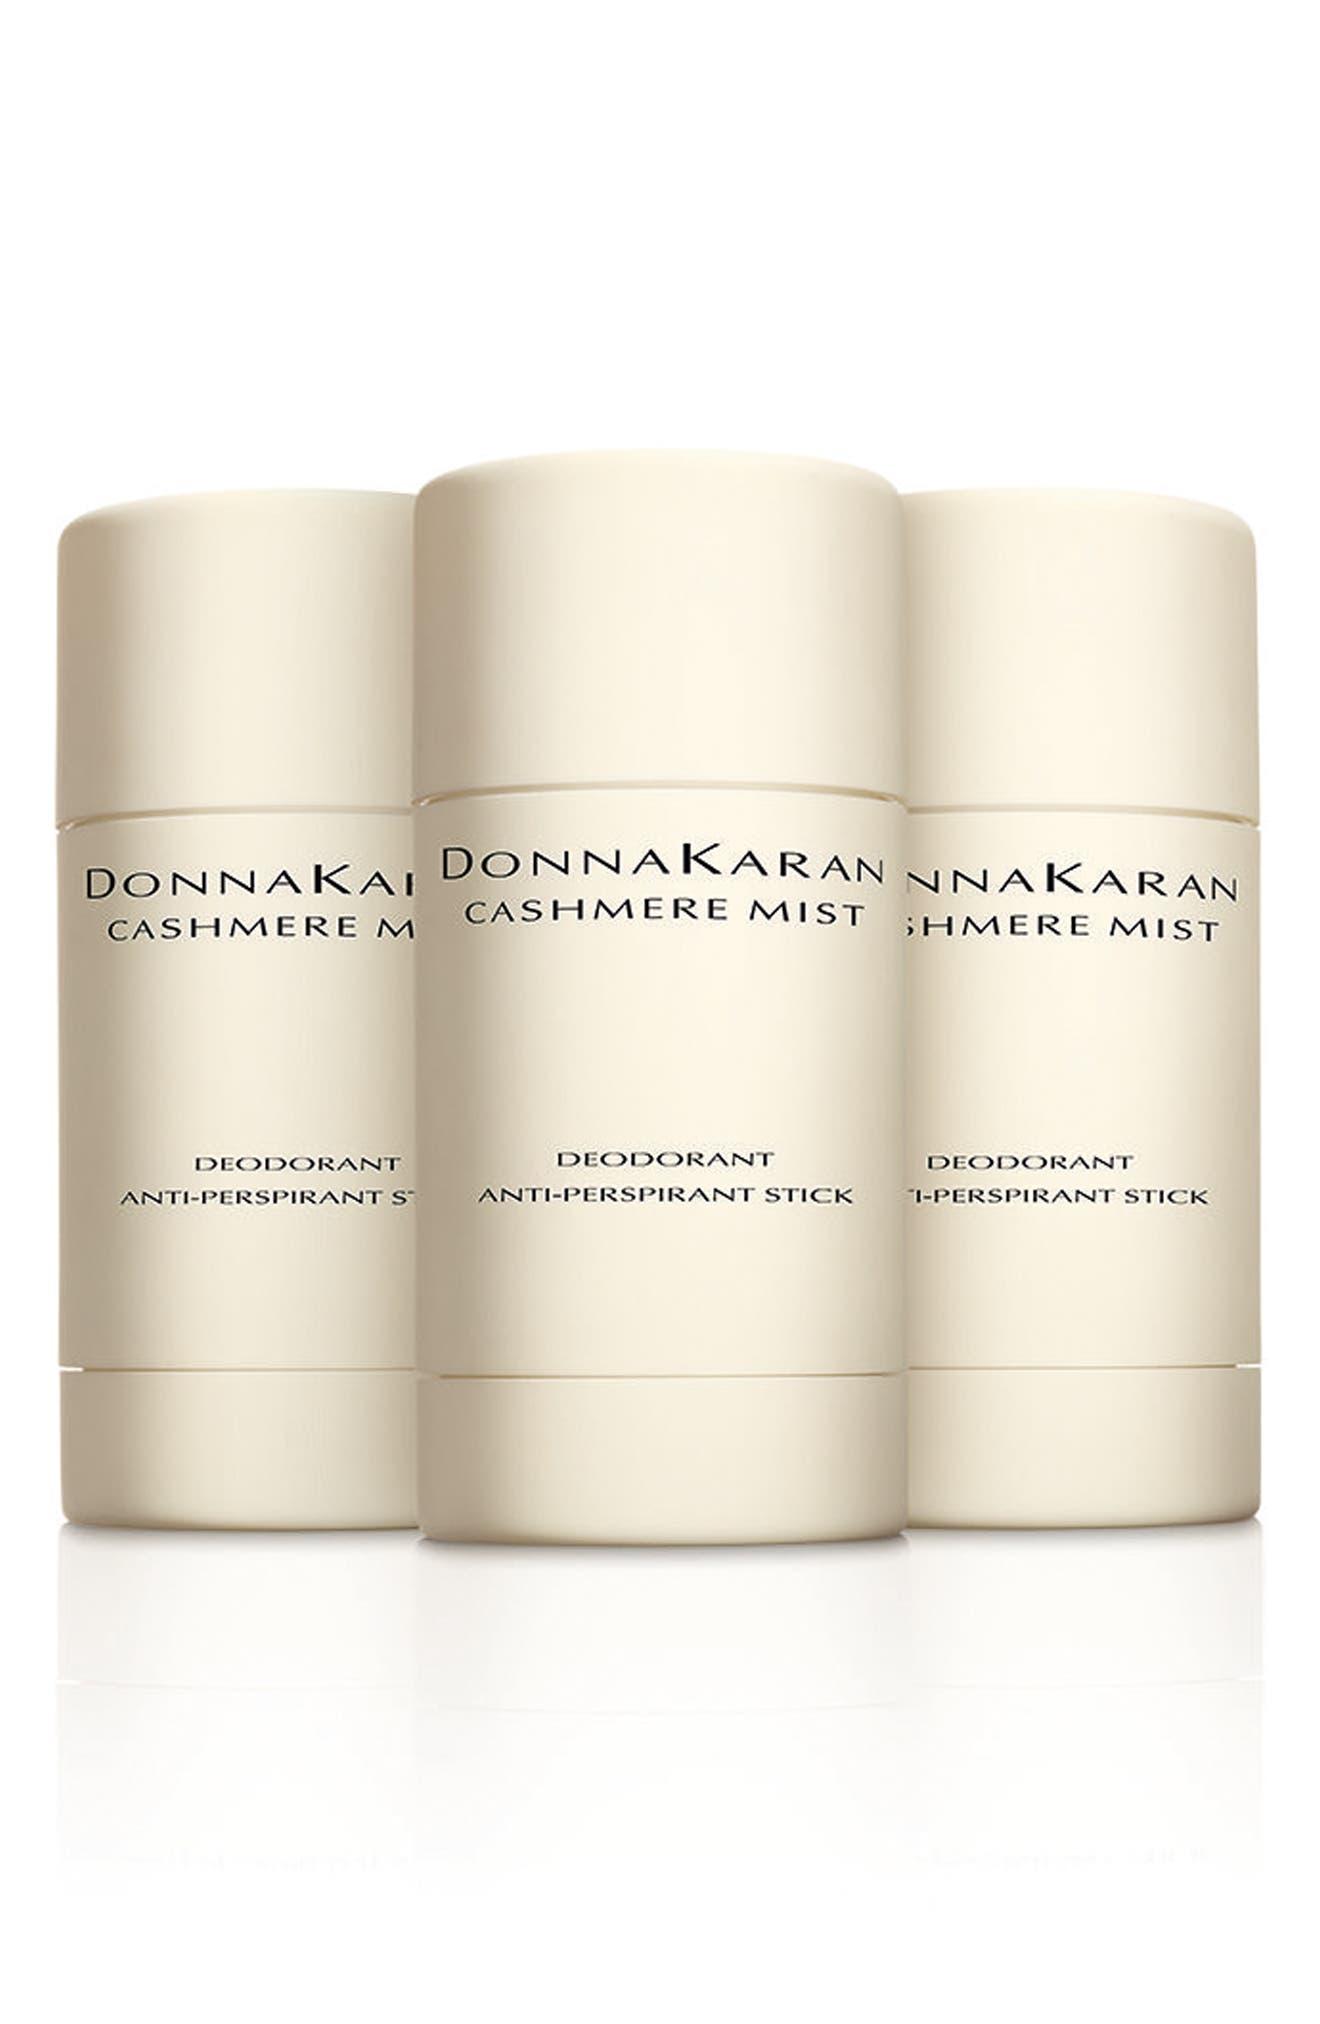 Donna Karan Cashmere Mist Deodorant Trio,                             Main thumbnail 1, color,                             000